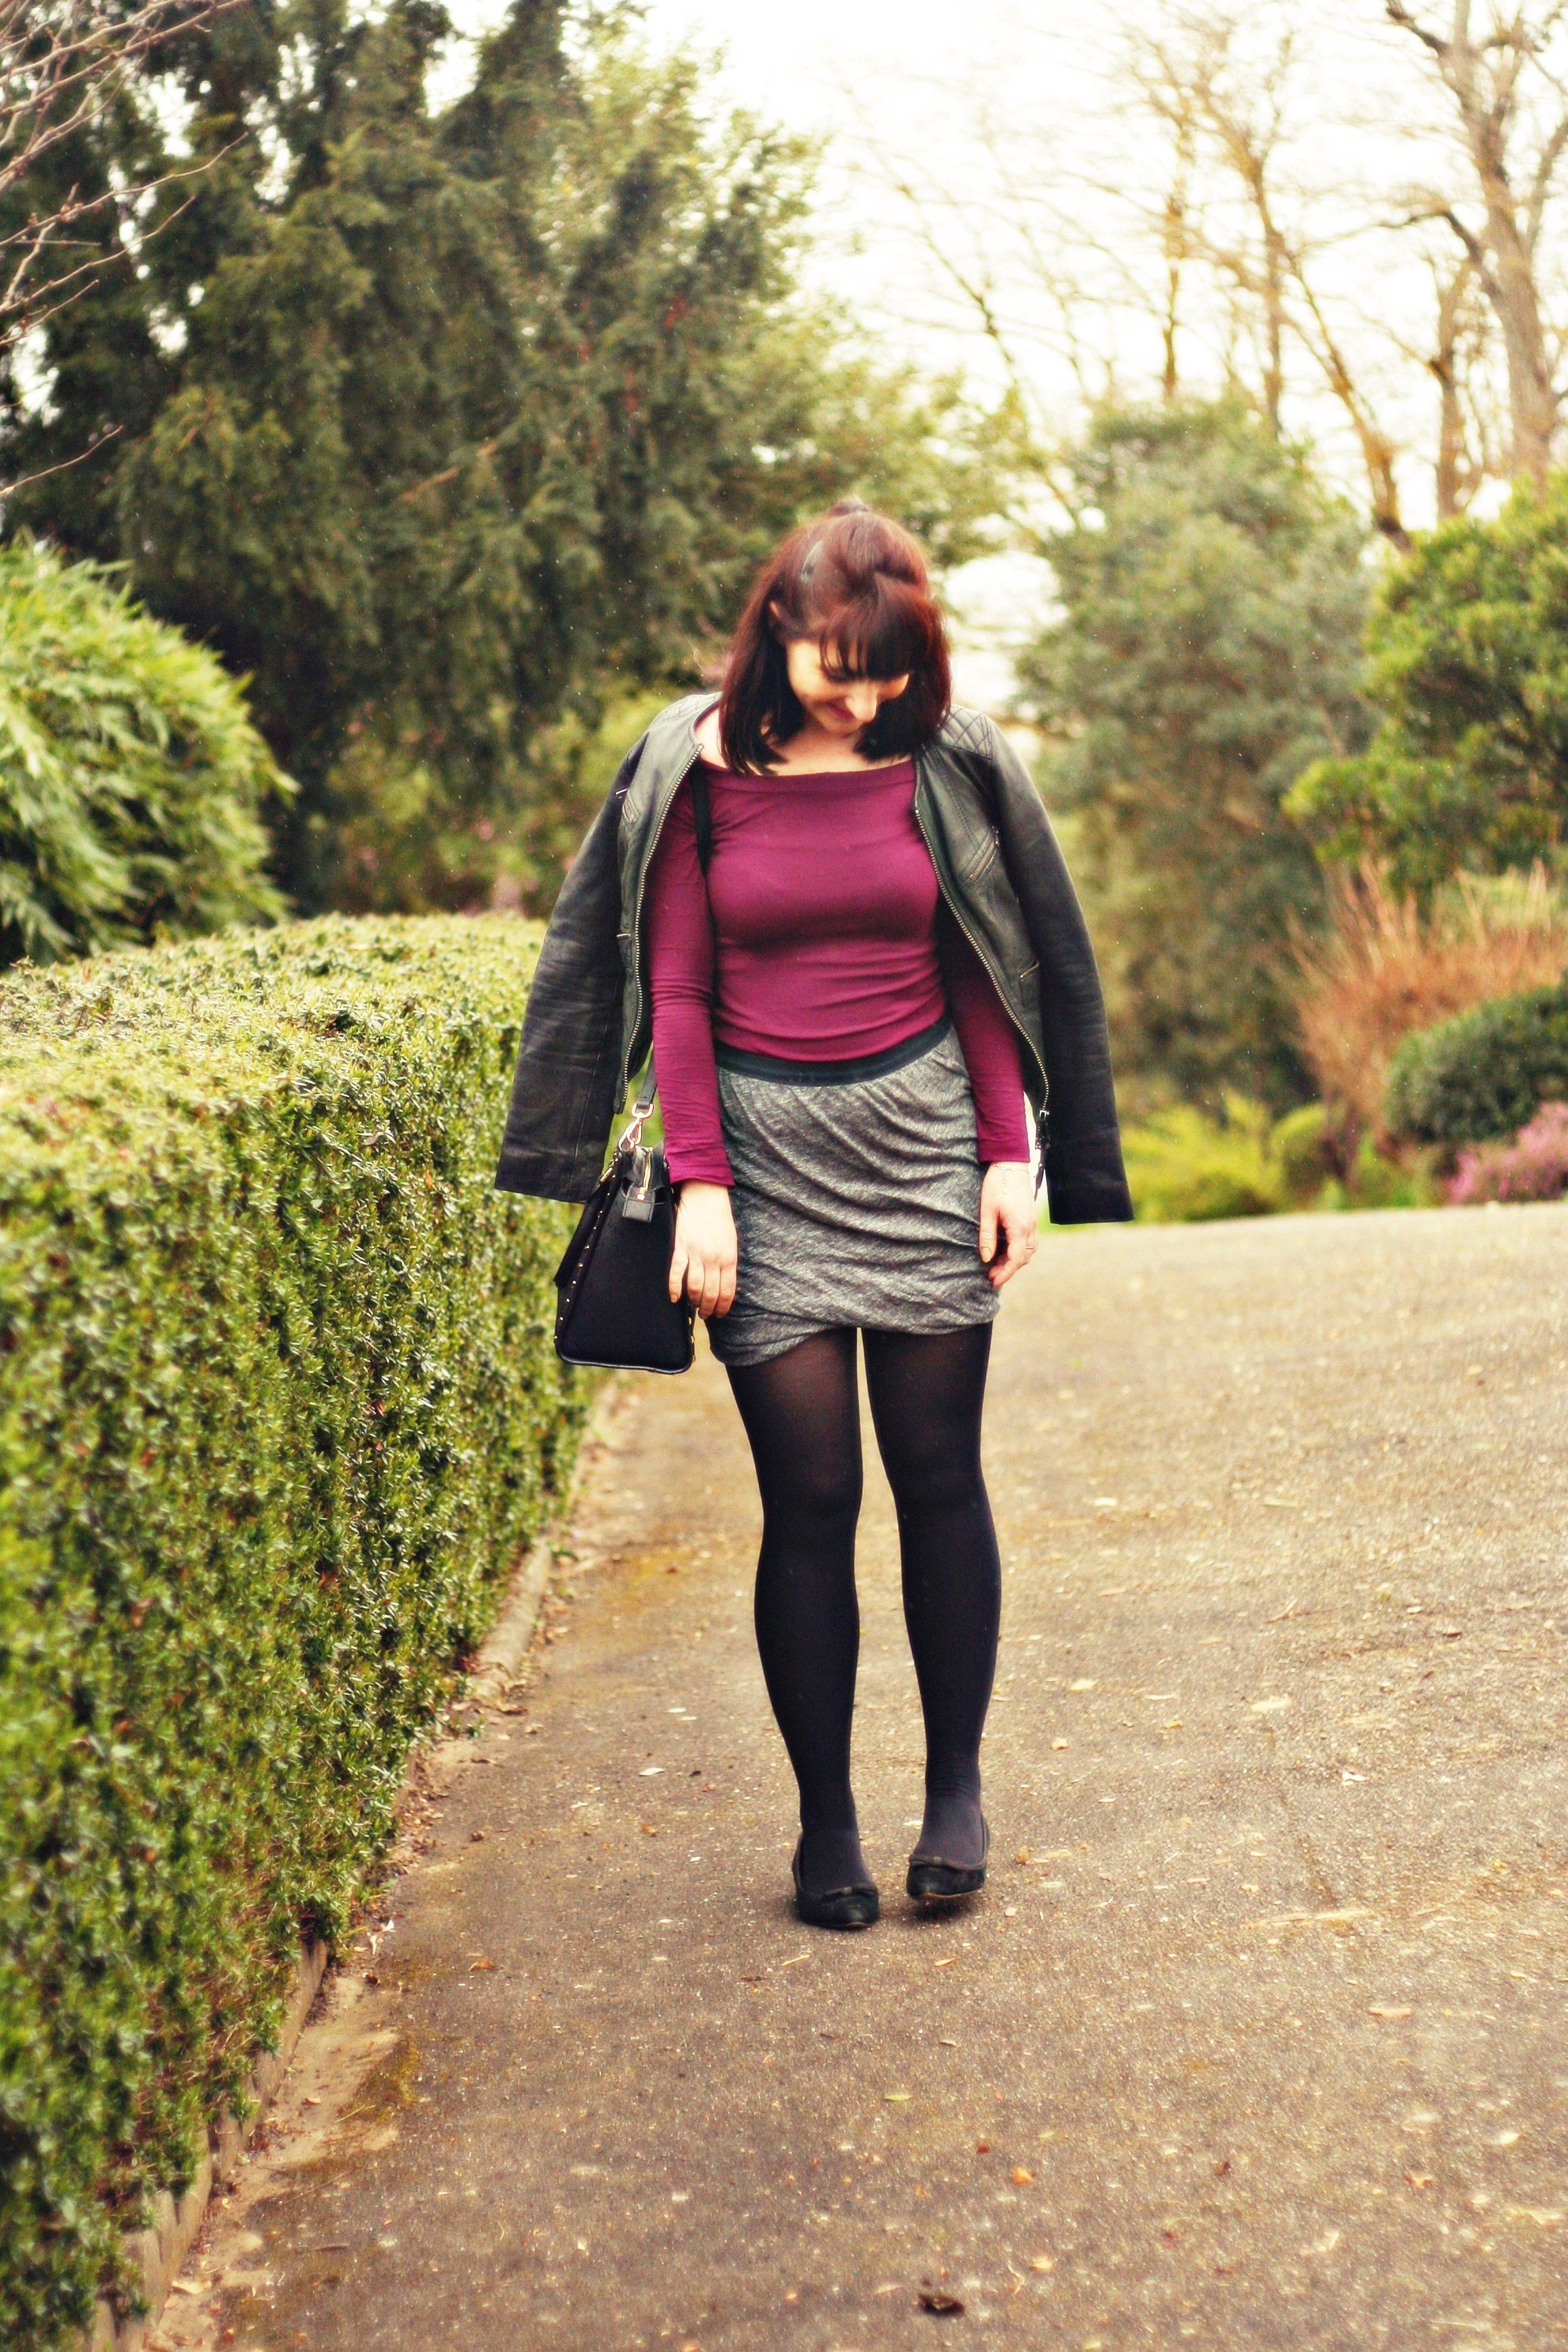 street-style-michaelkors-top-encolure-80-asos-blog-mode-femme-toulouse-jupe-drapé-american-vintage